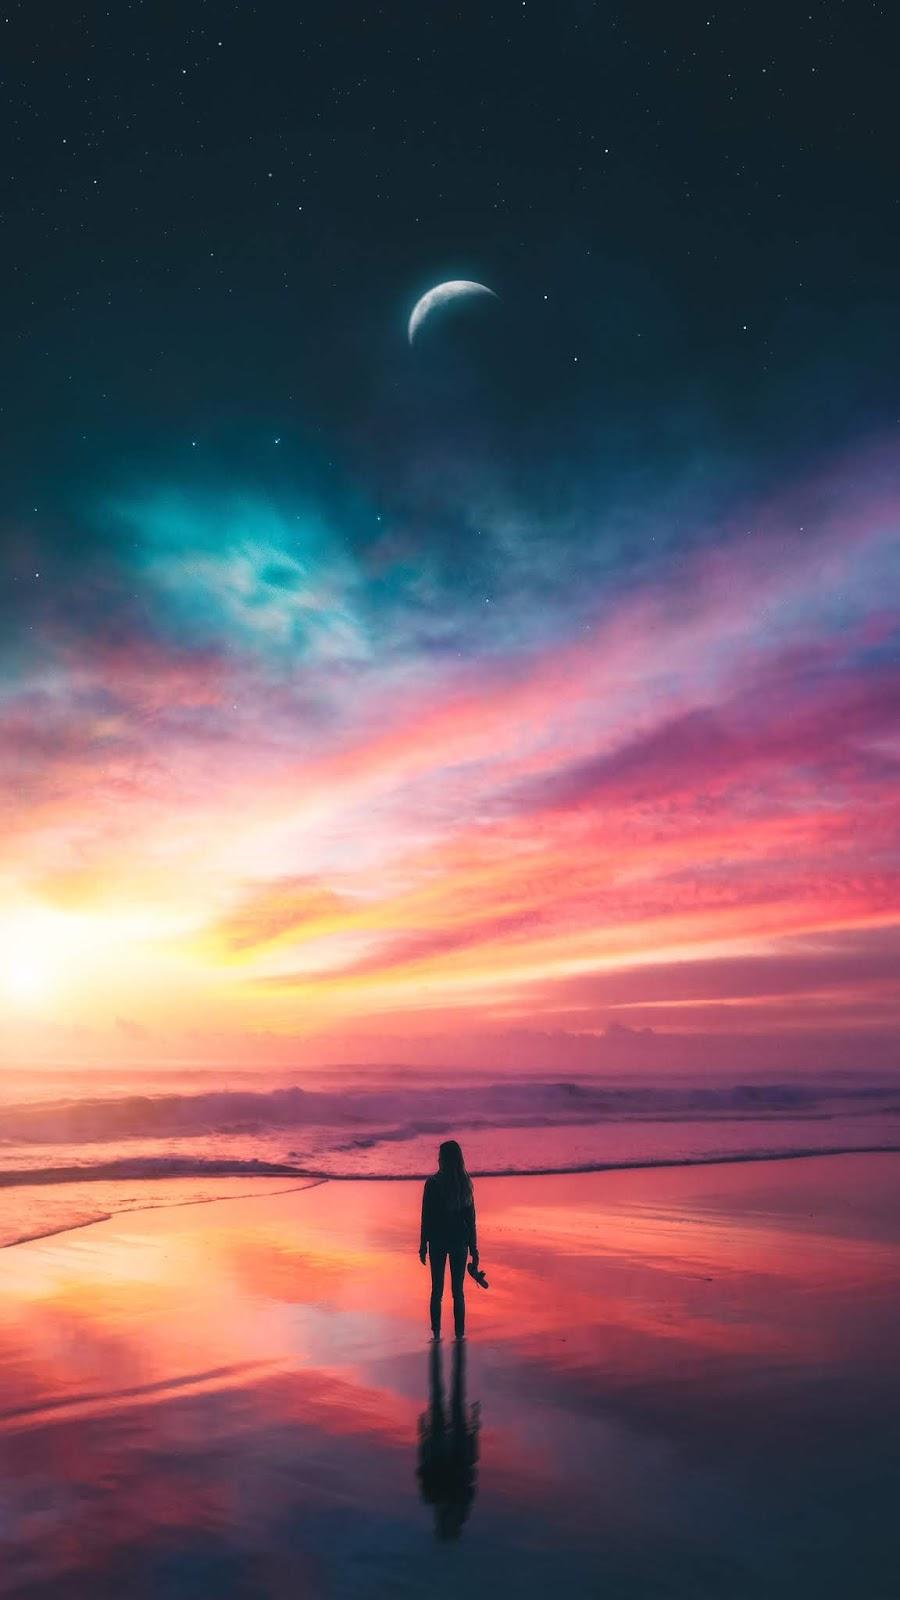 Galactic sunset